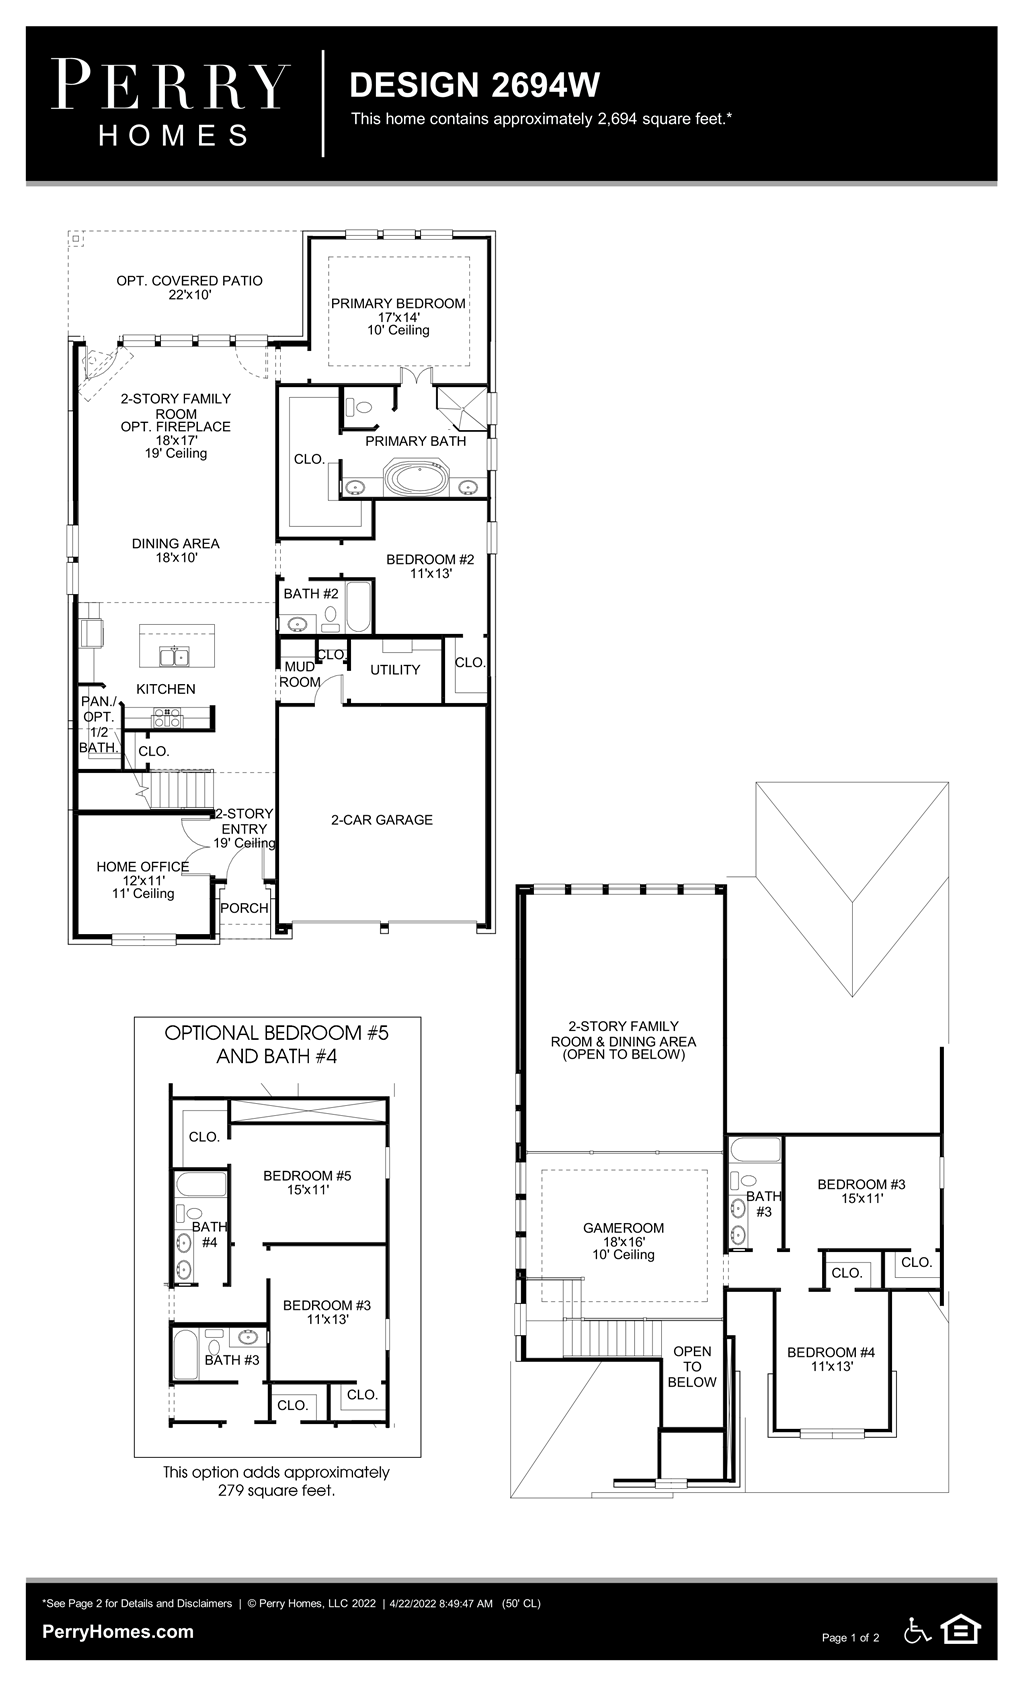 Floor Plan for 2694W